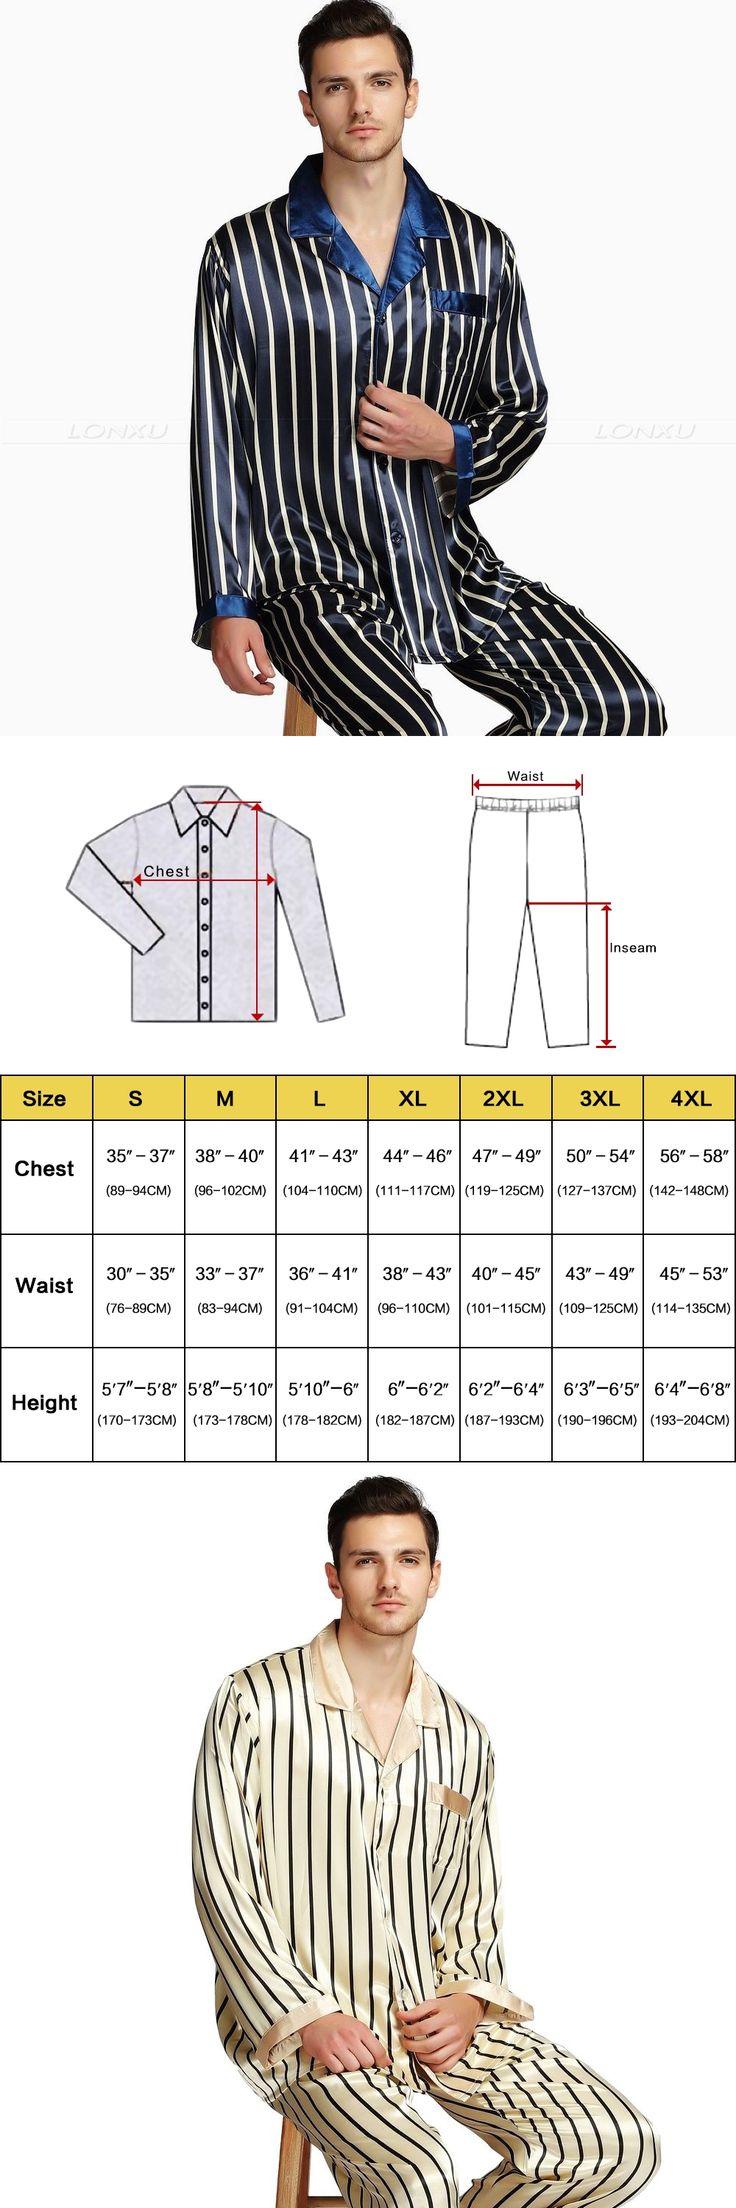 Mens Silk Satin Pajamas Set  Pajama Pyjamas PJS Set  Sleepwear  Loungewear  S,M,L,XL,2XL ,3XL Plus__Fits All Seasons